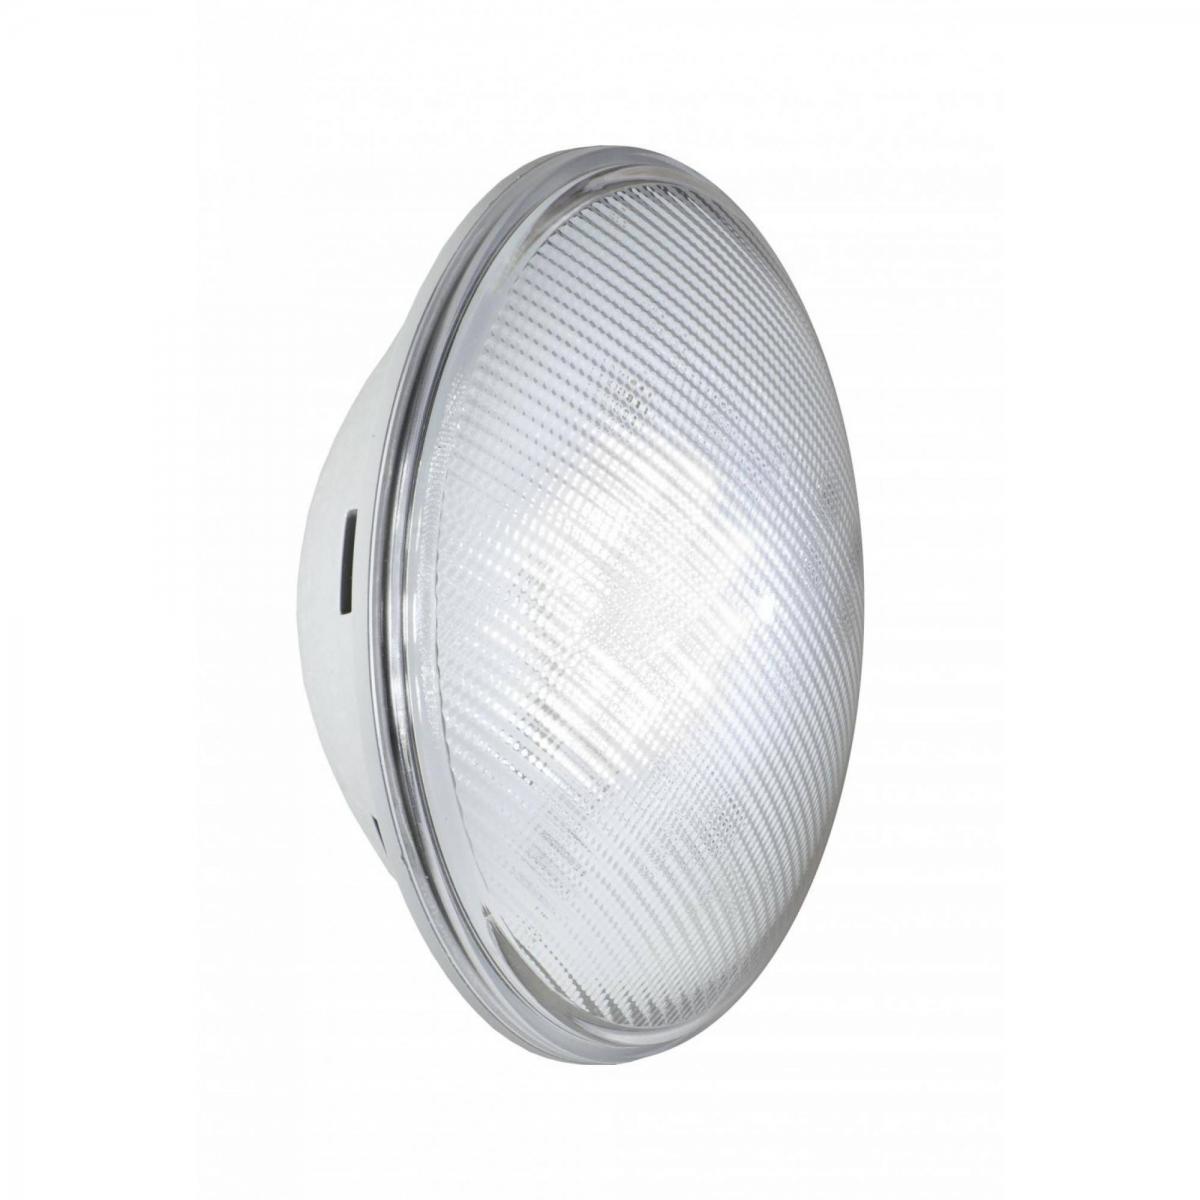 Lámparas LumiPlus PAR56 1.11